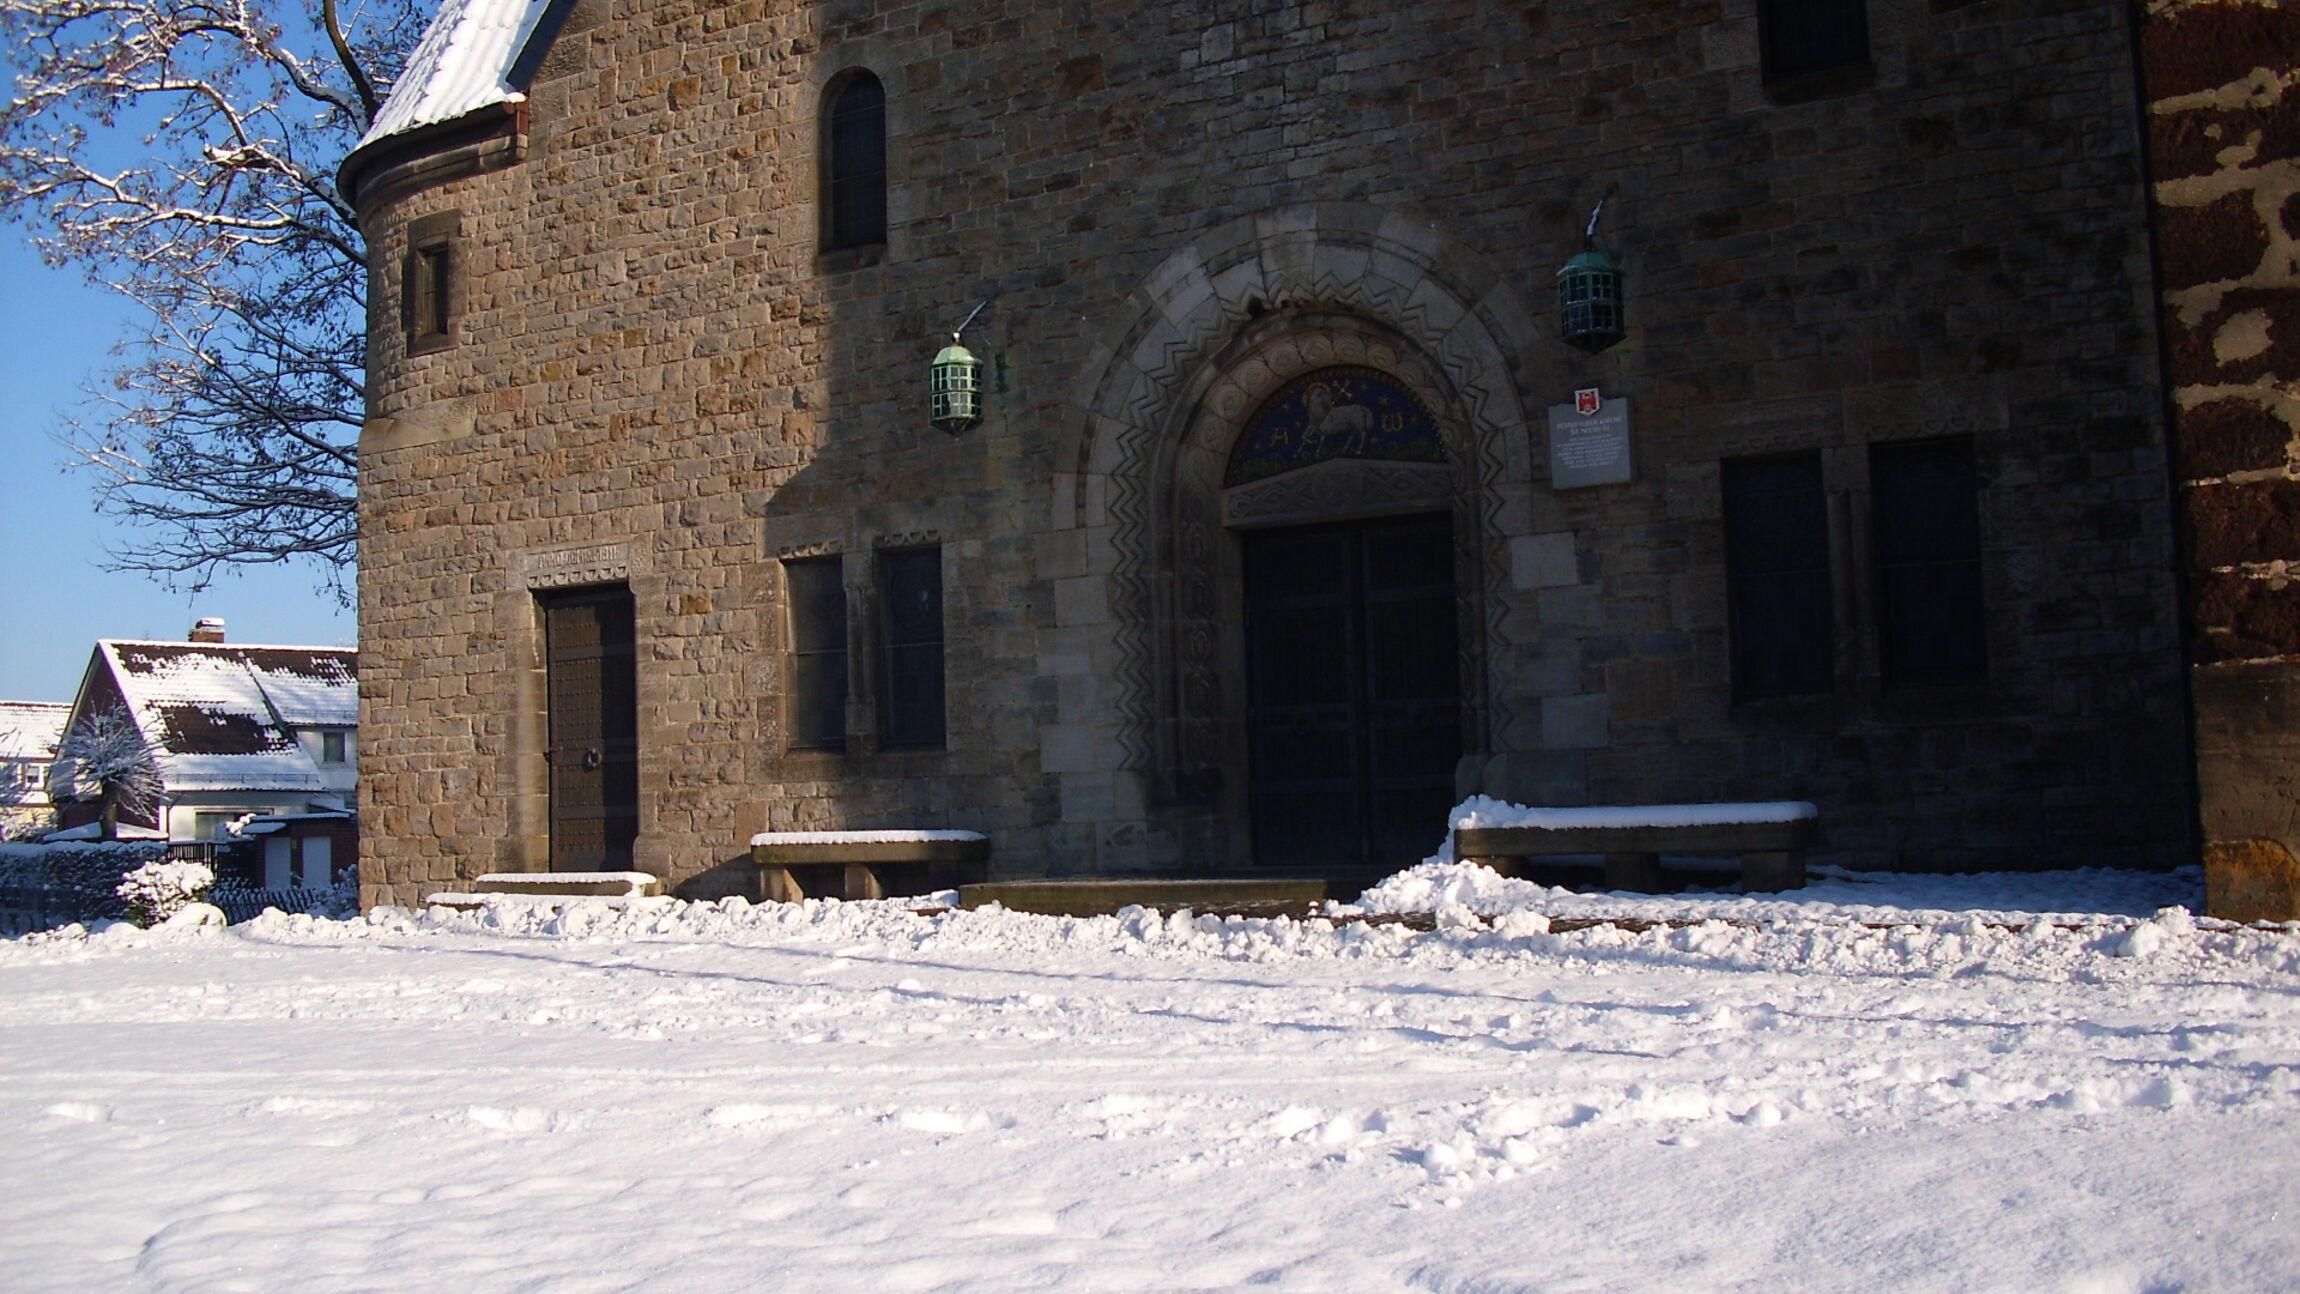 St. Nicolai im Winter